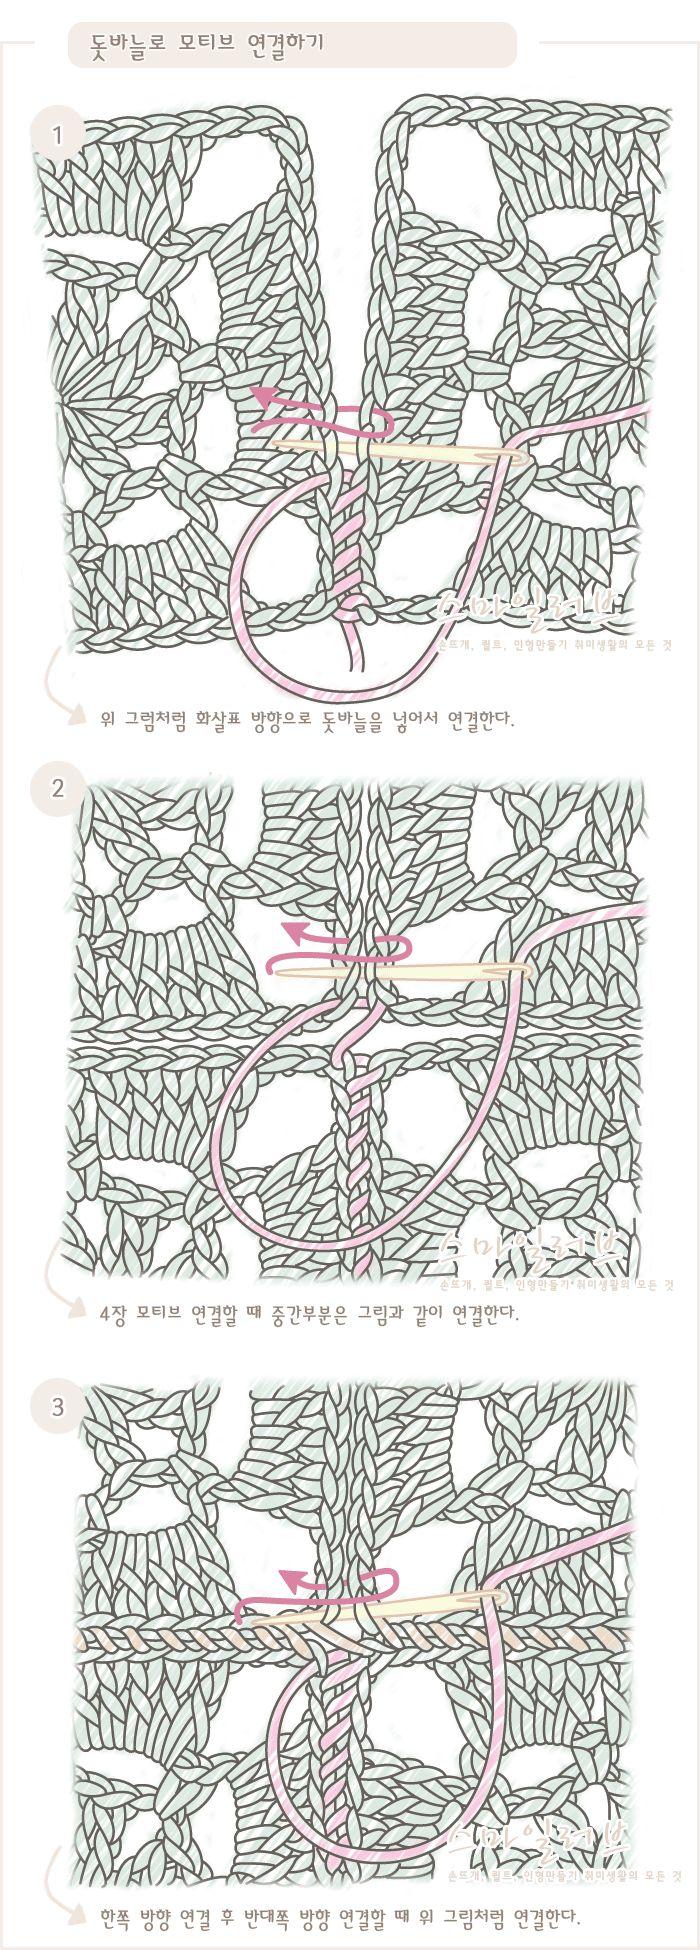 8478 best tejidos images on Pinterest | Crochet patterns, Crochet ...